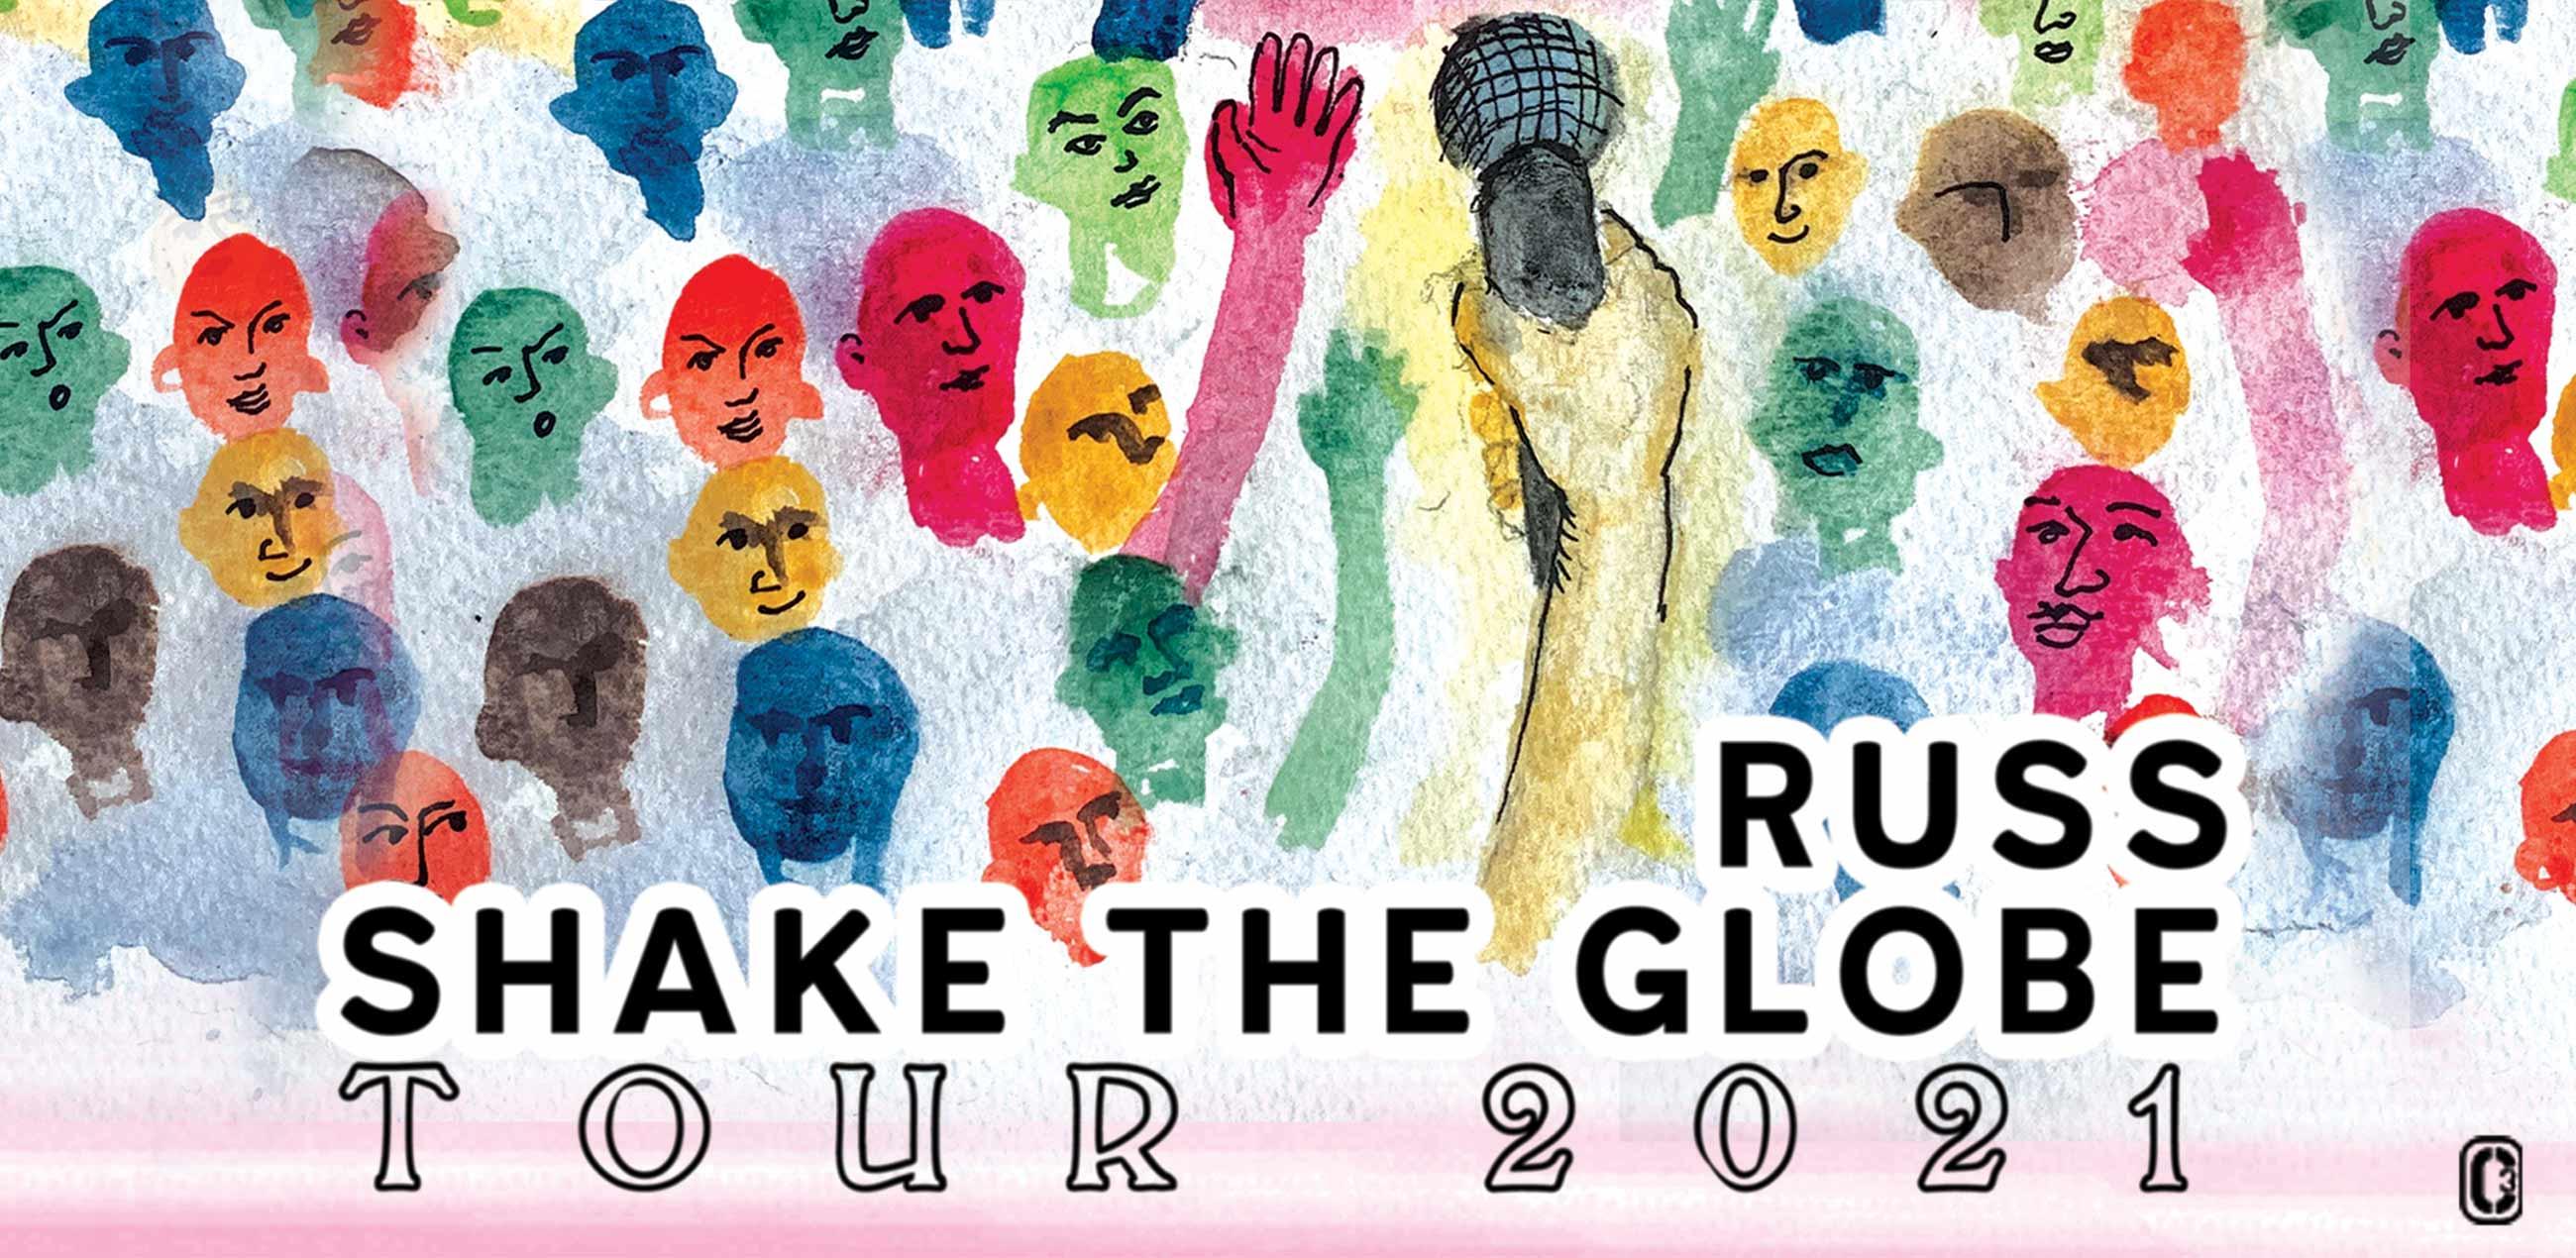 Russ Shake The Globe Tour Dates 2021 Calendar